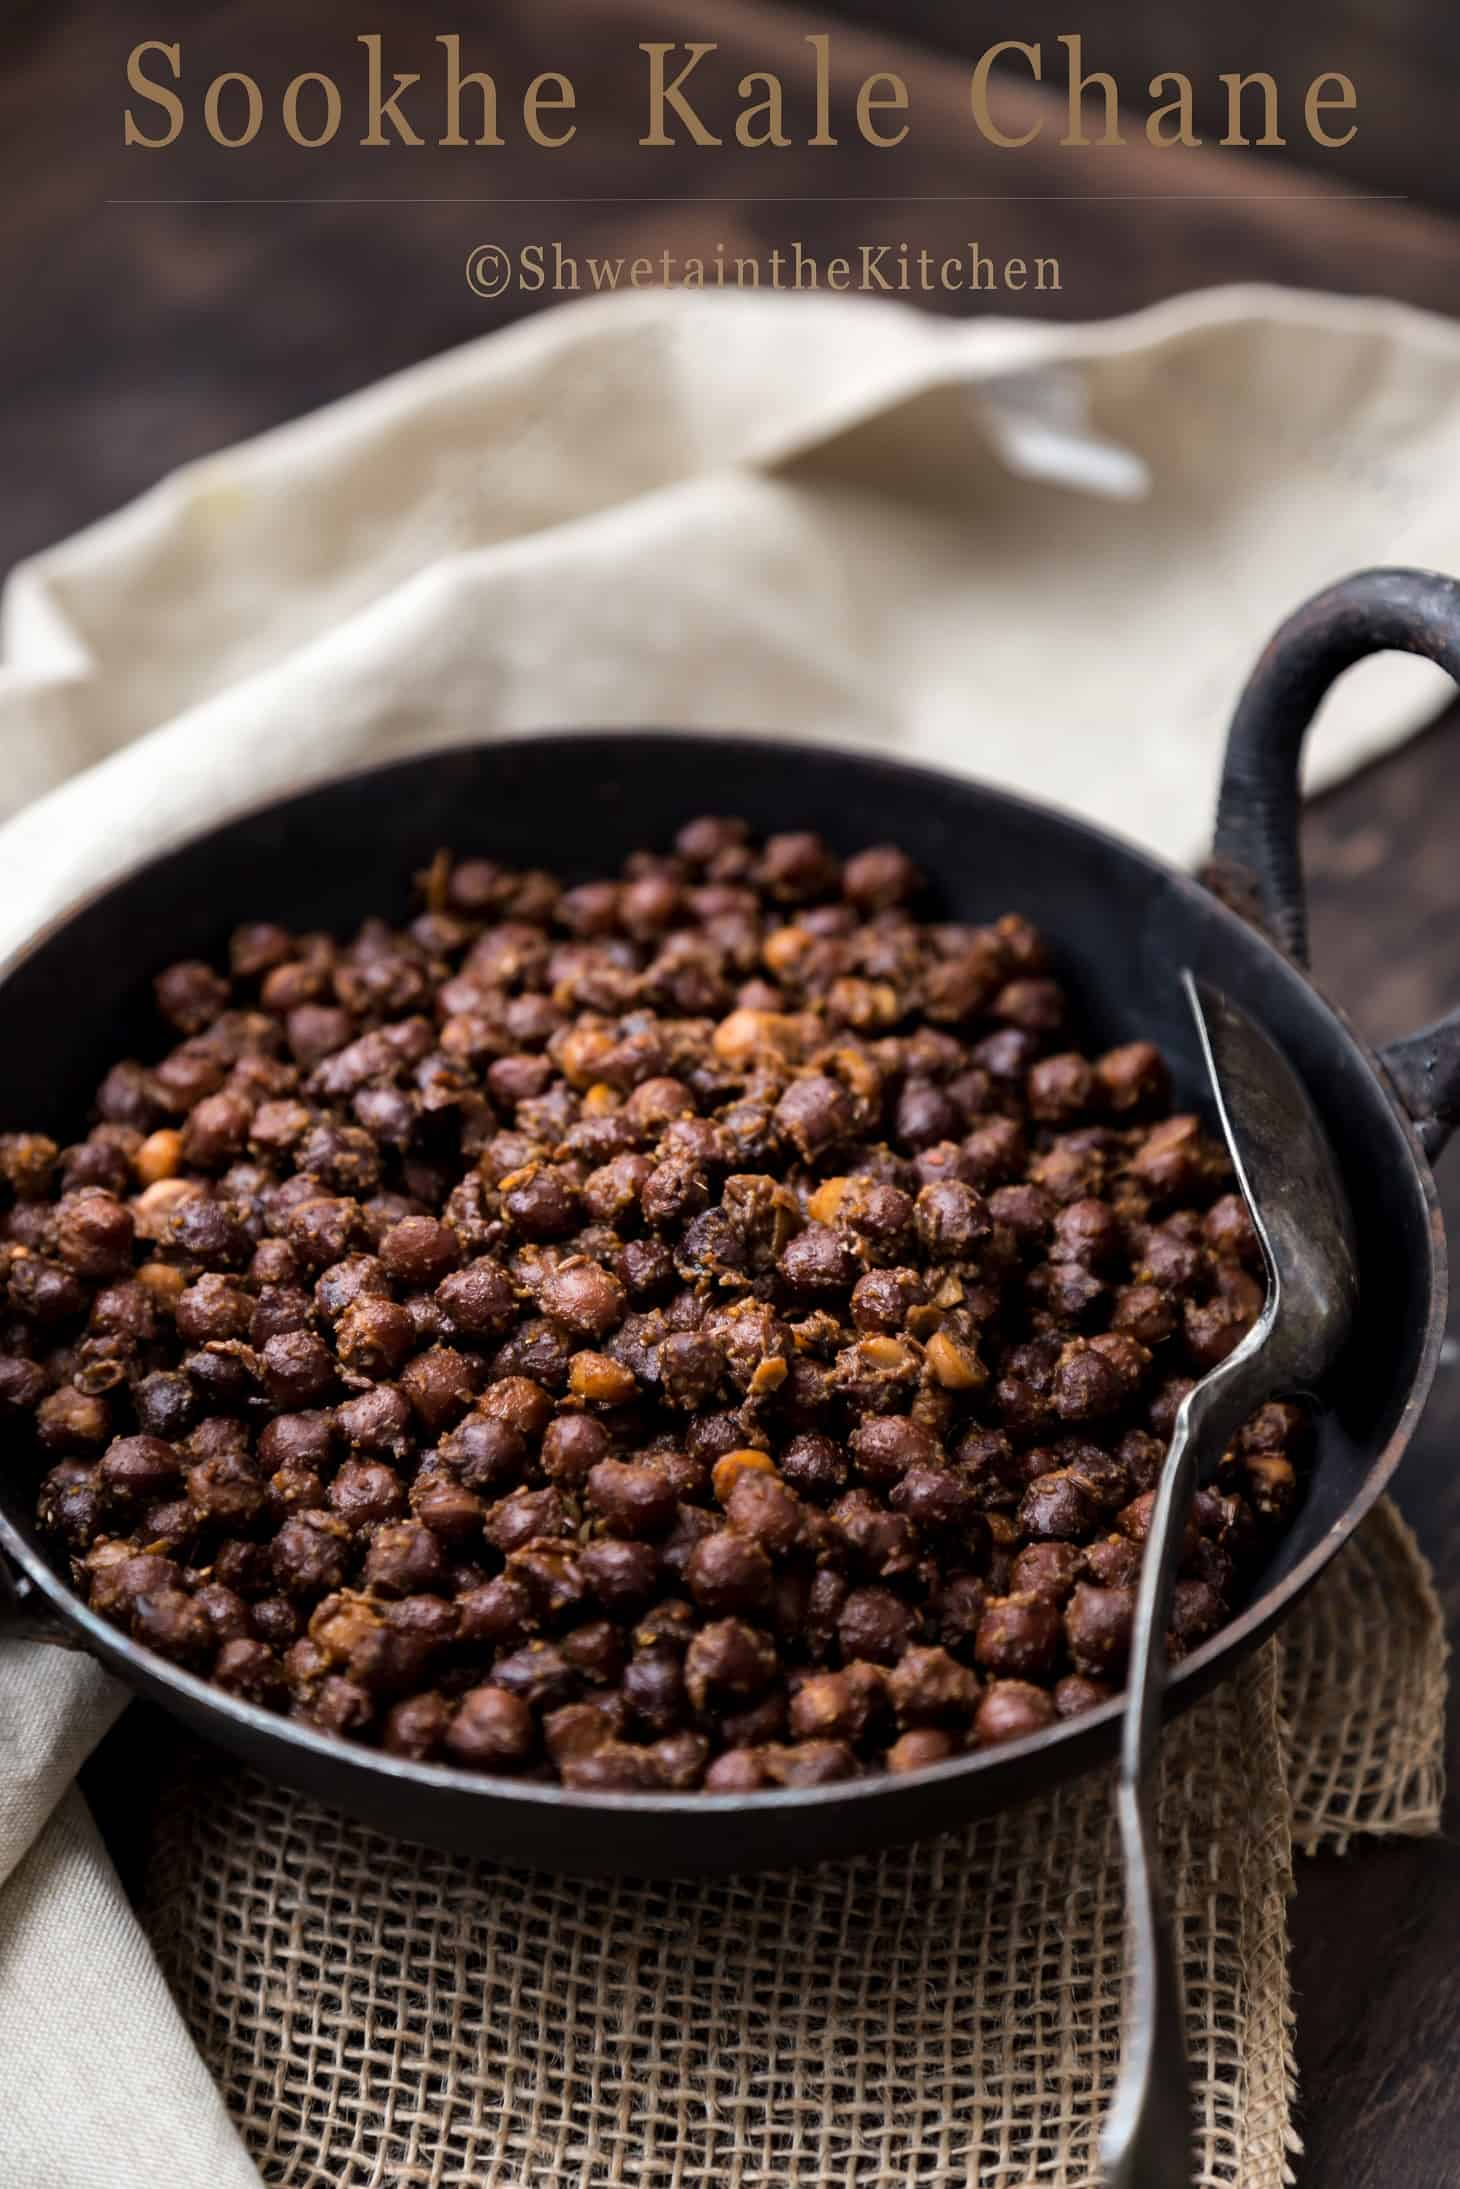 Sookhe Kala chana curry in black wok with spoon